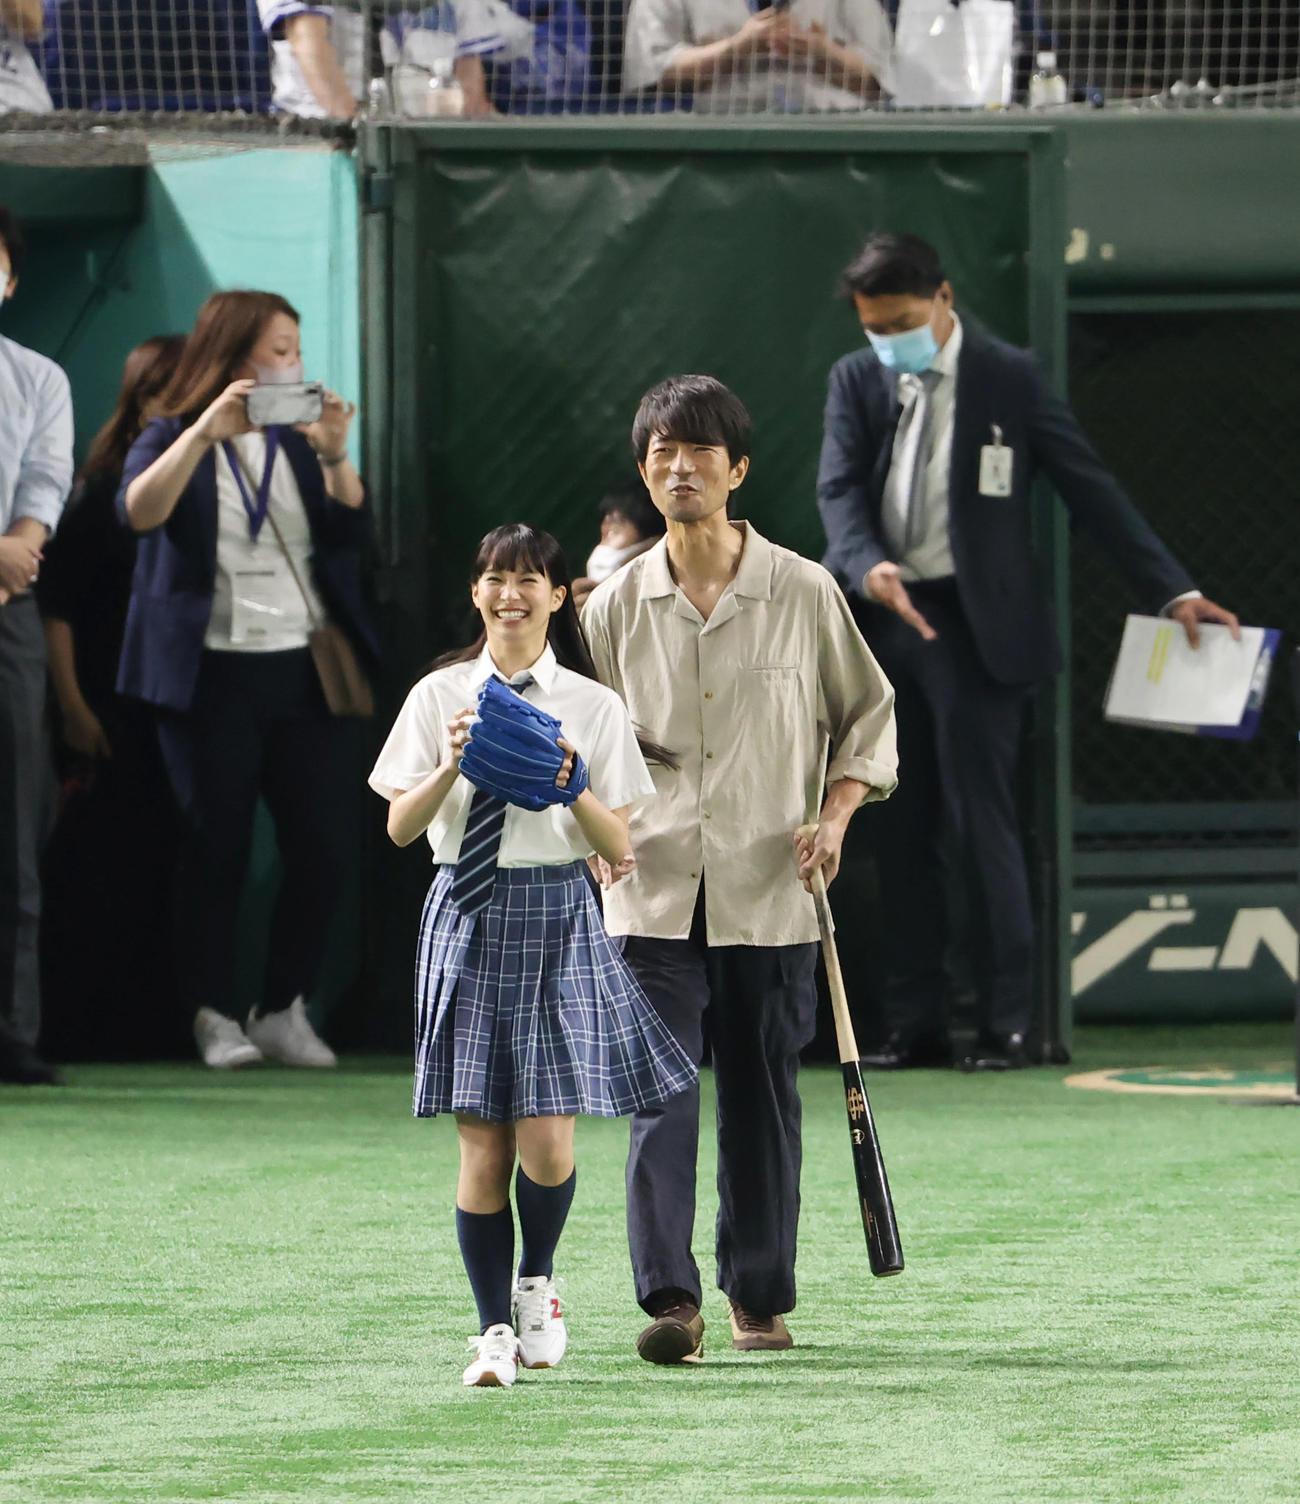 DeNA対広島 試合前、始球式に登場する関水渚(左)と仲村トオル(撮影・垰建太)